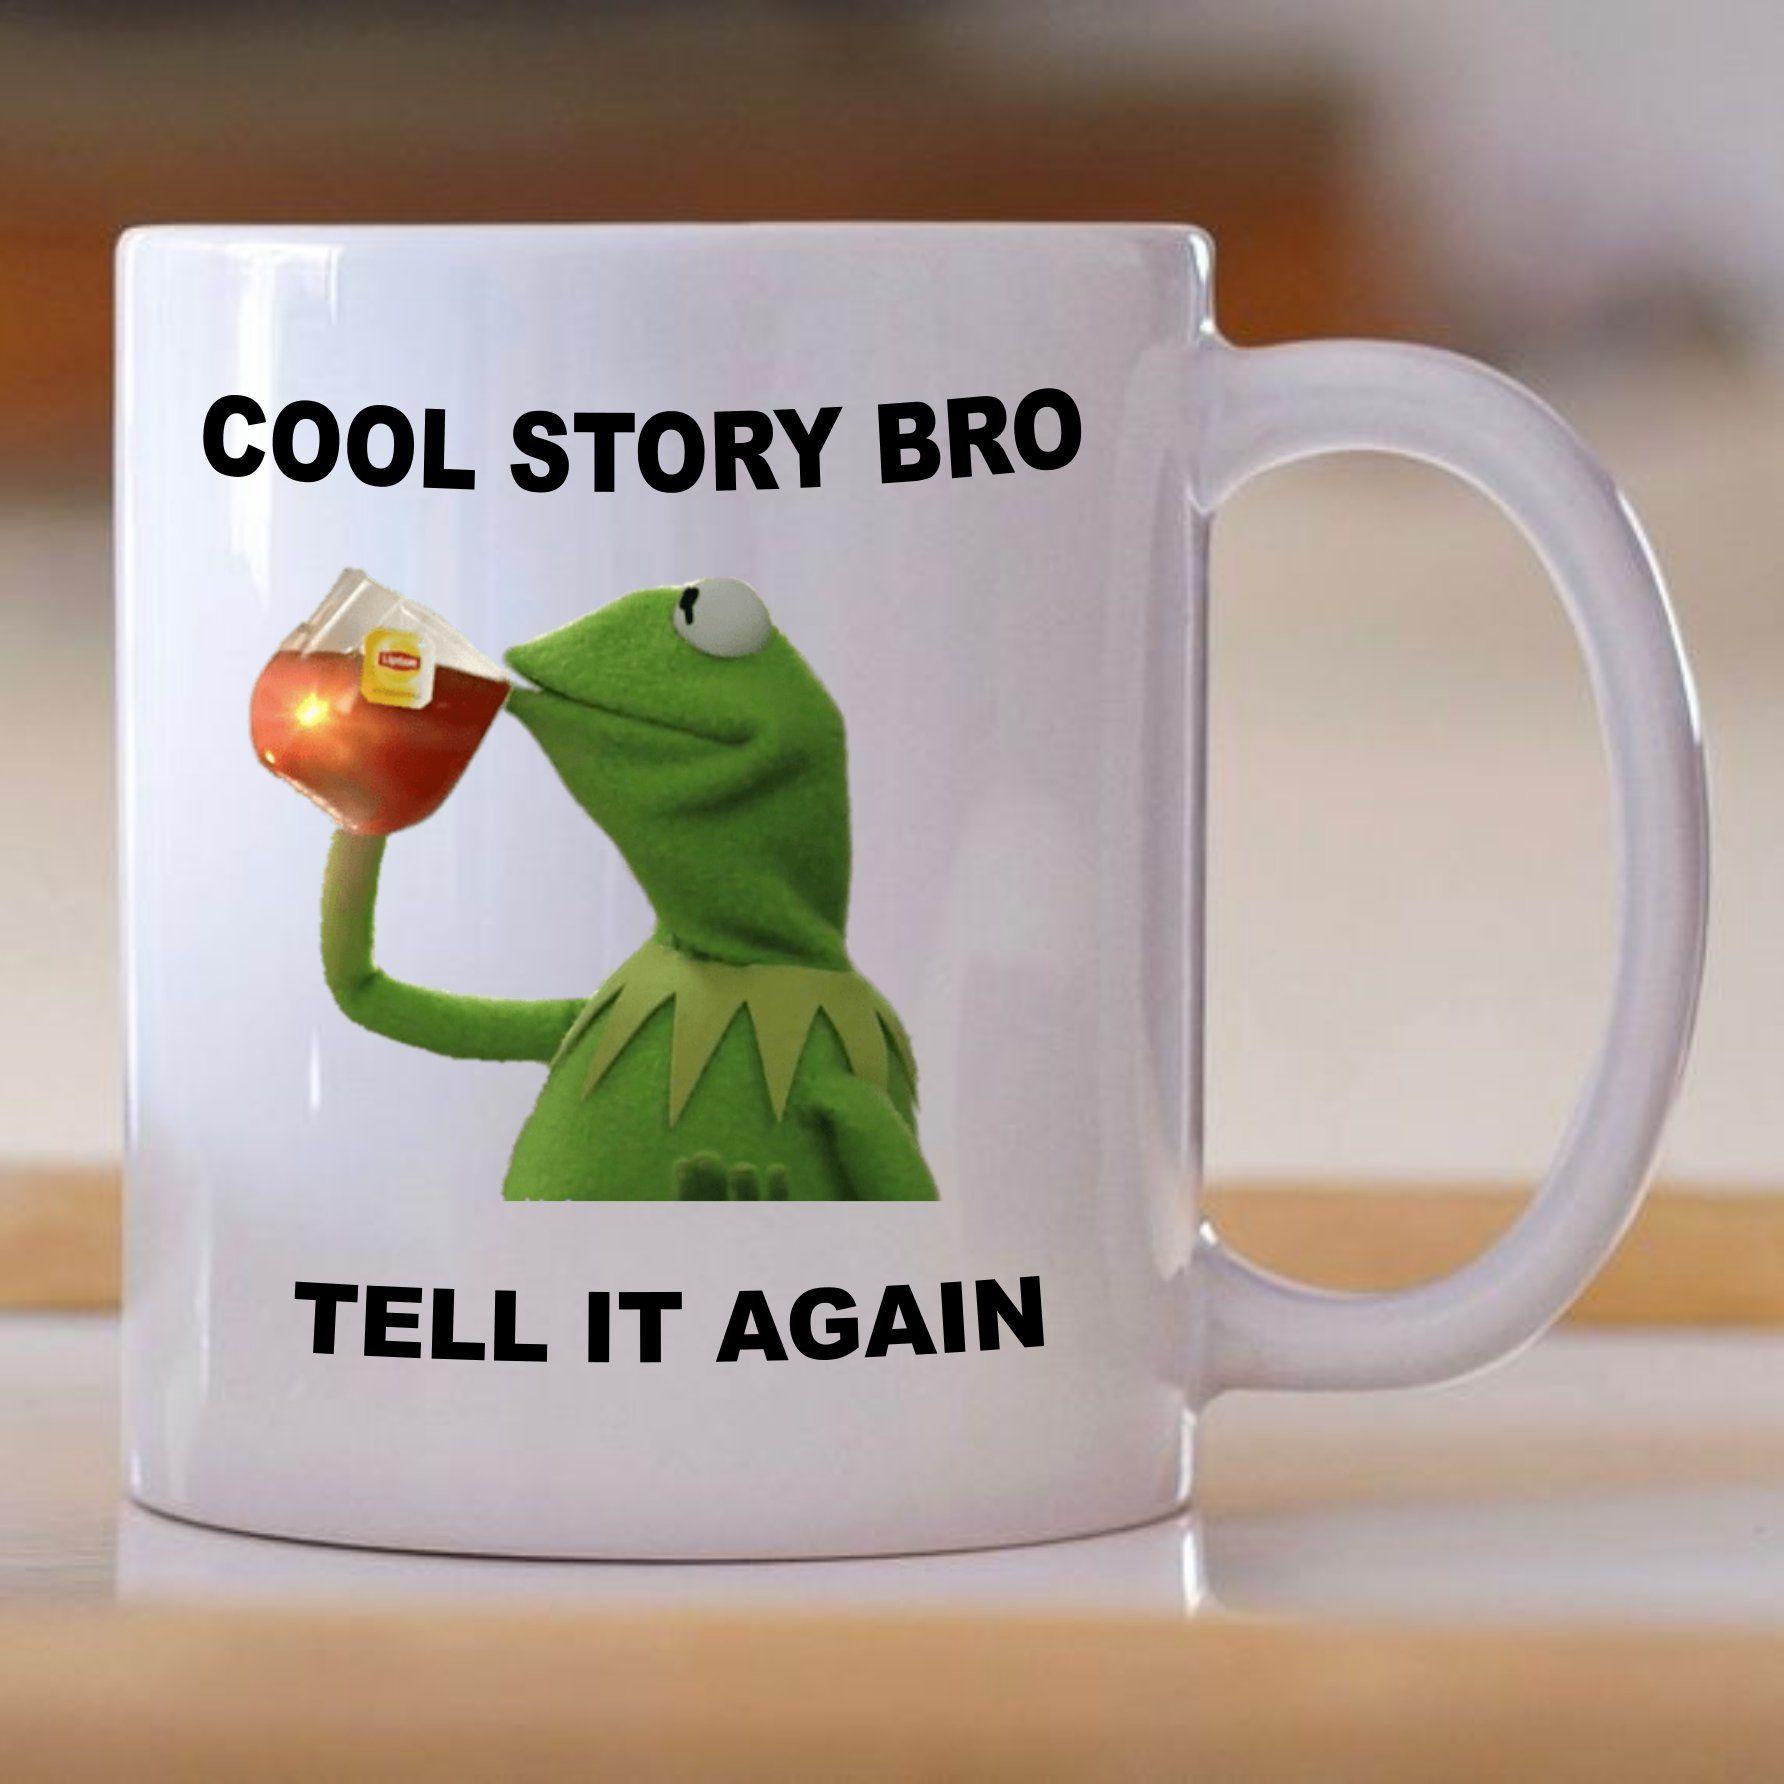 Story Frog Meme Office Mug Ceramic The Cool Kermit Bro 6fYbgyv7